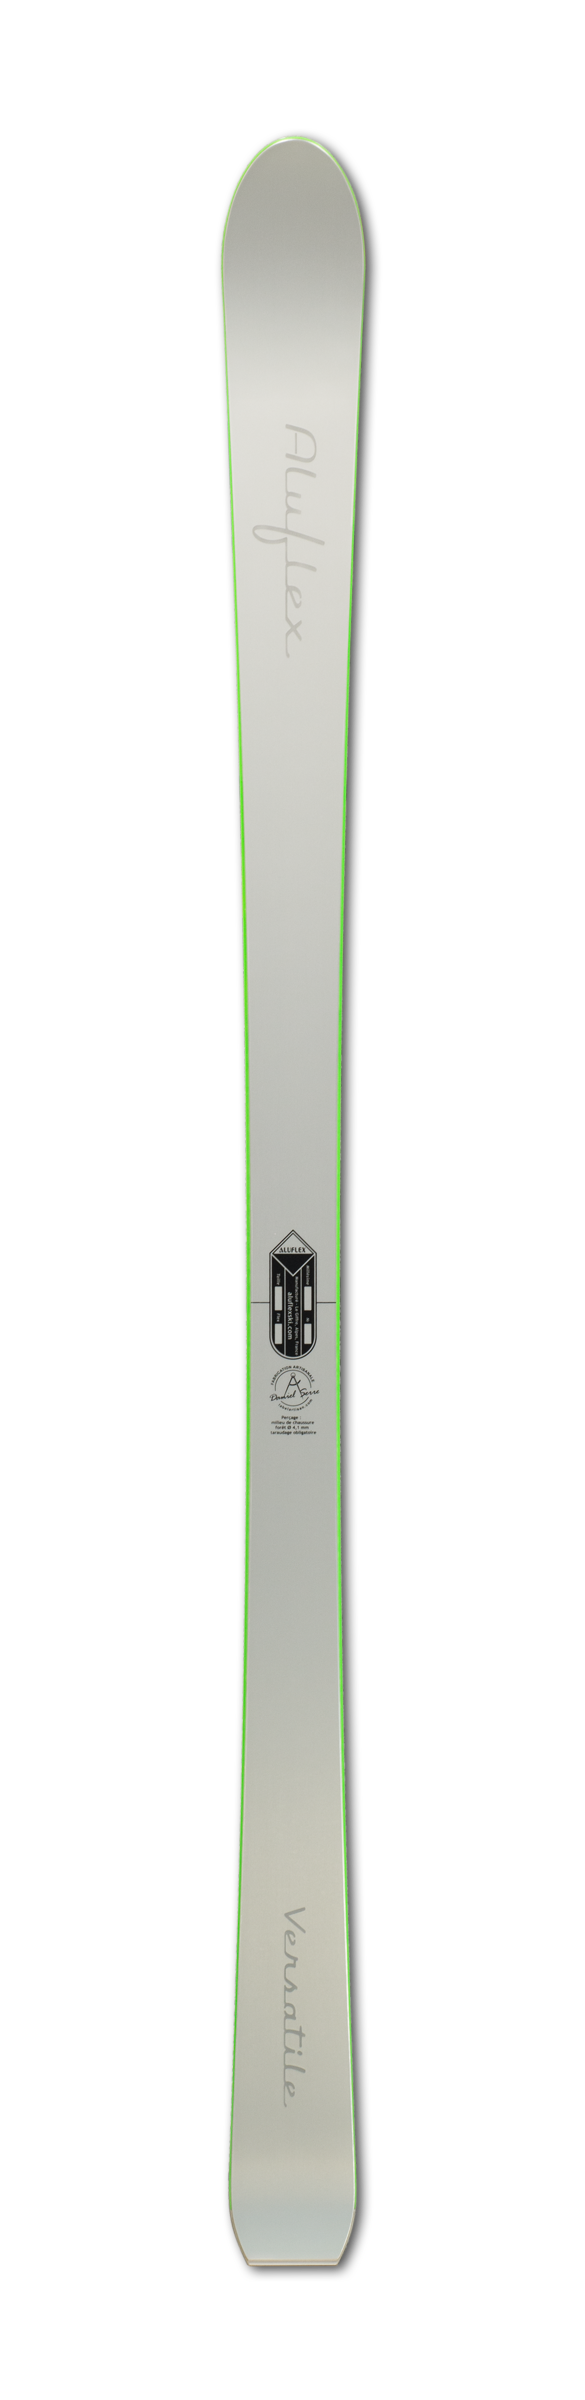 Ski Aluflex Versatile 181